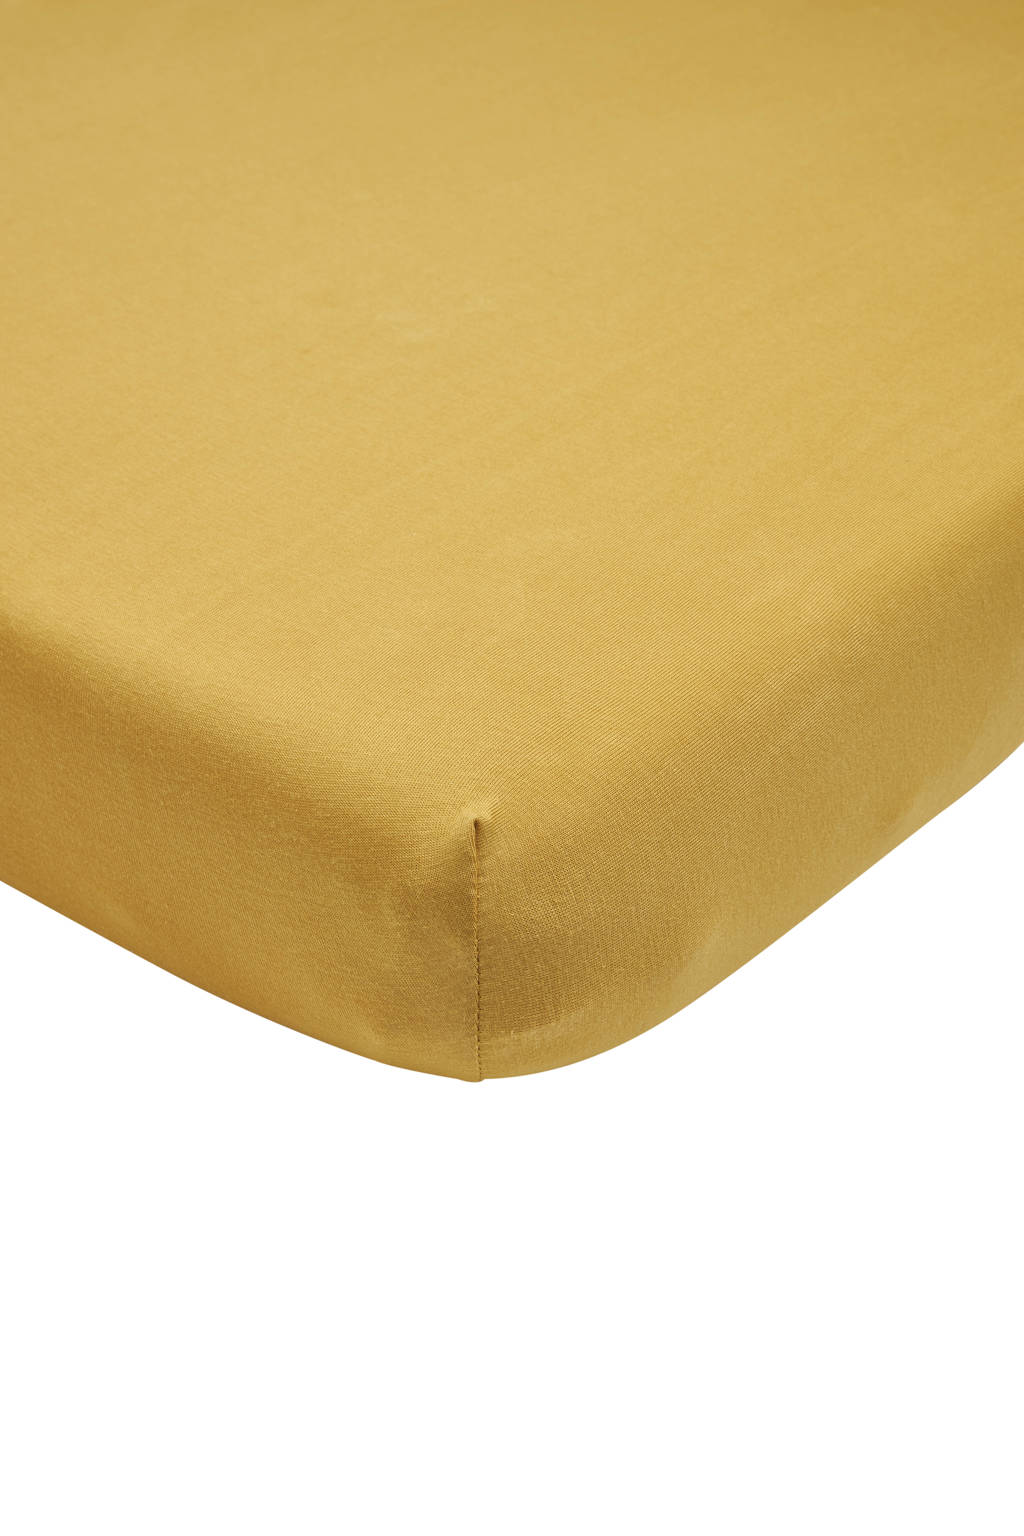 Meyco jersey hoeslaken boxmatras 75x95 cm honey gold, Goud